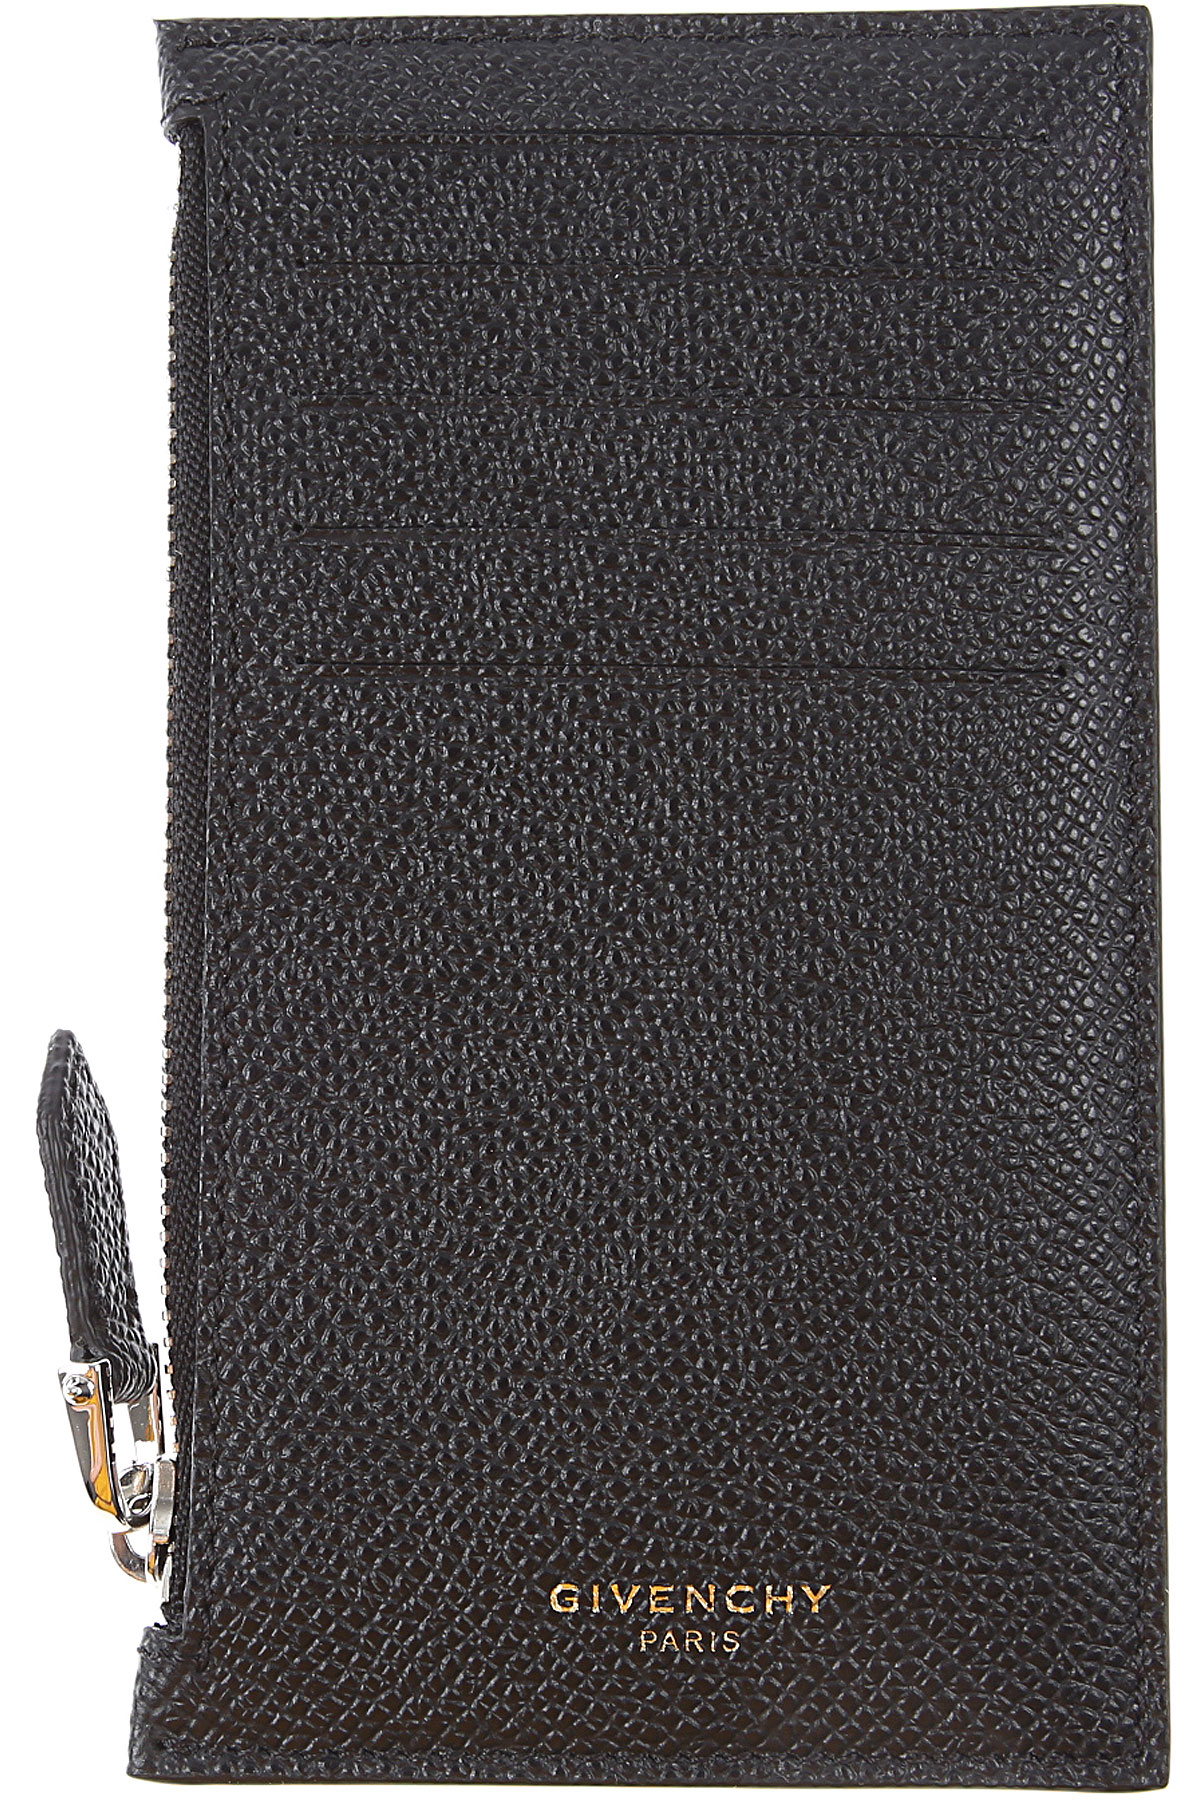 Salvatore Ferragamo Belts On Sale, Black, Leather, 2019, 42 46